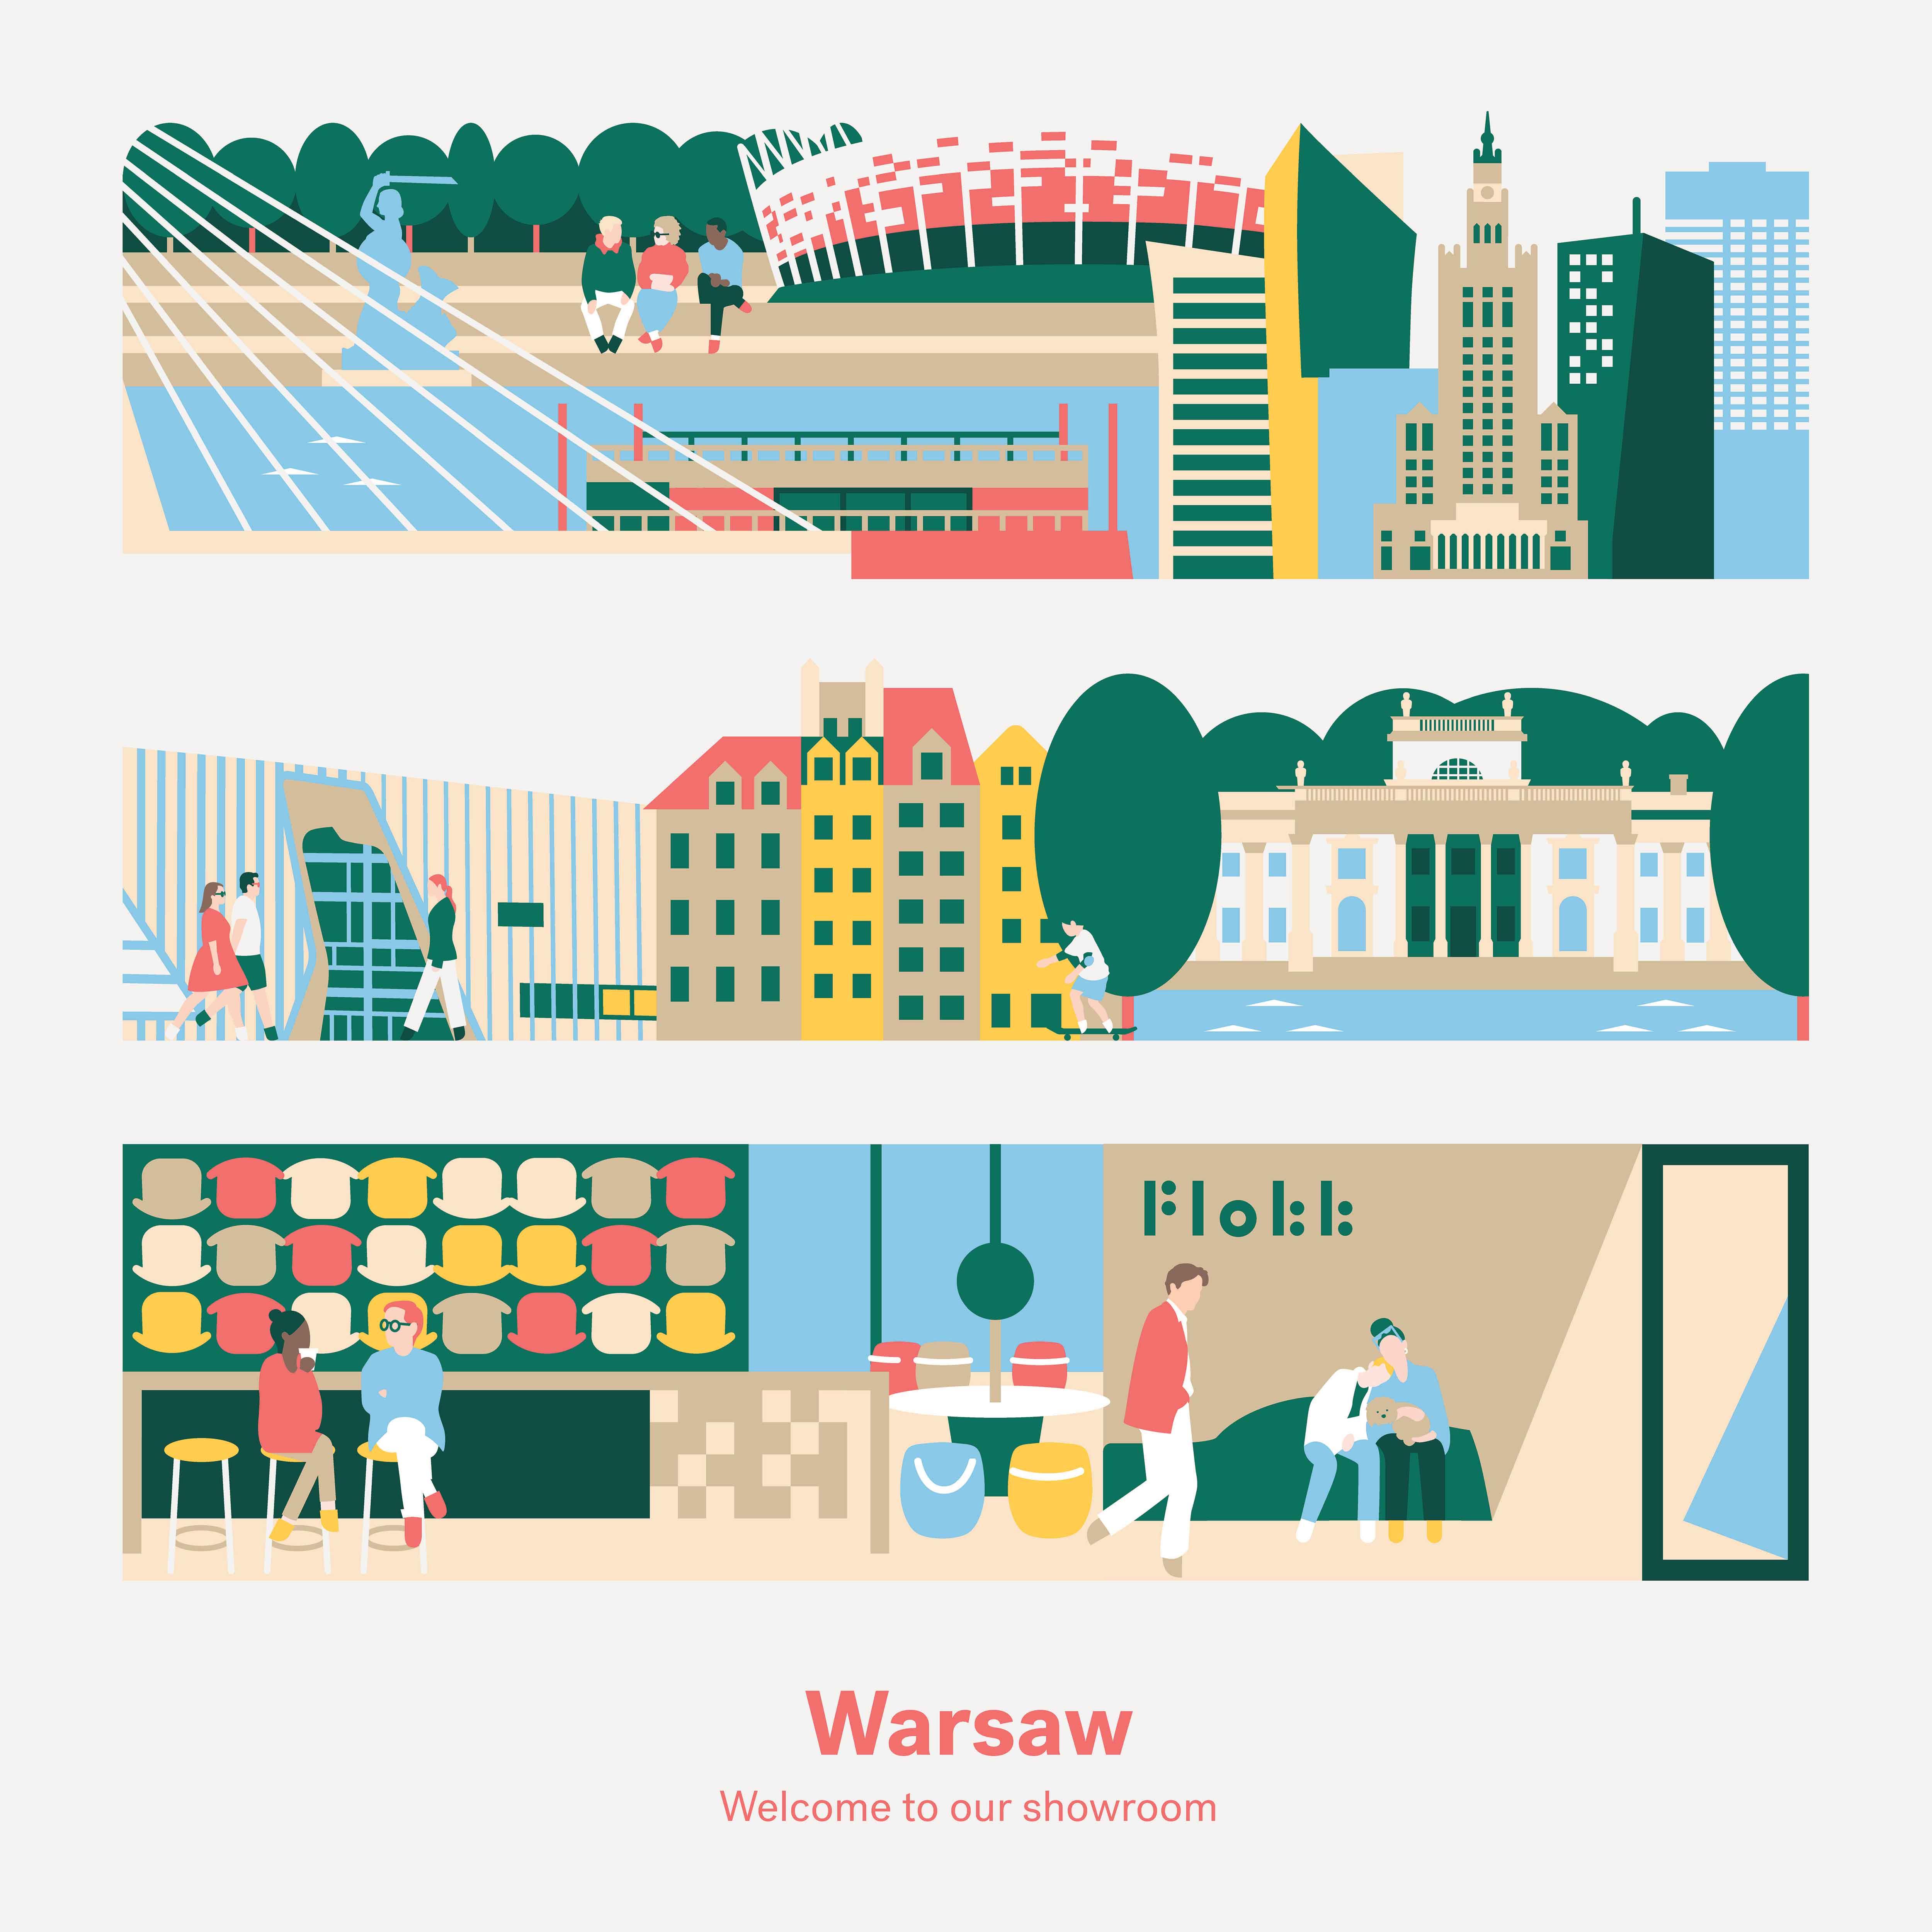 FLOKK_Warsaw_small